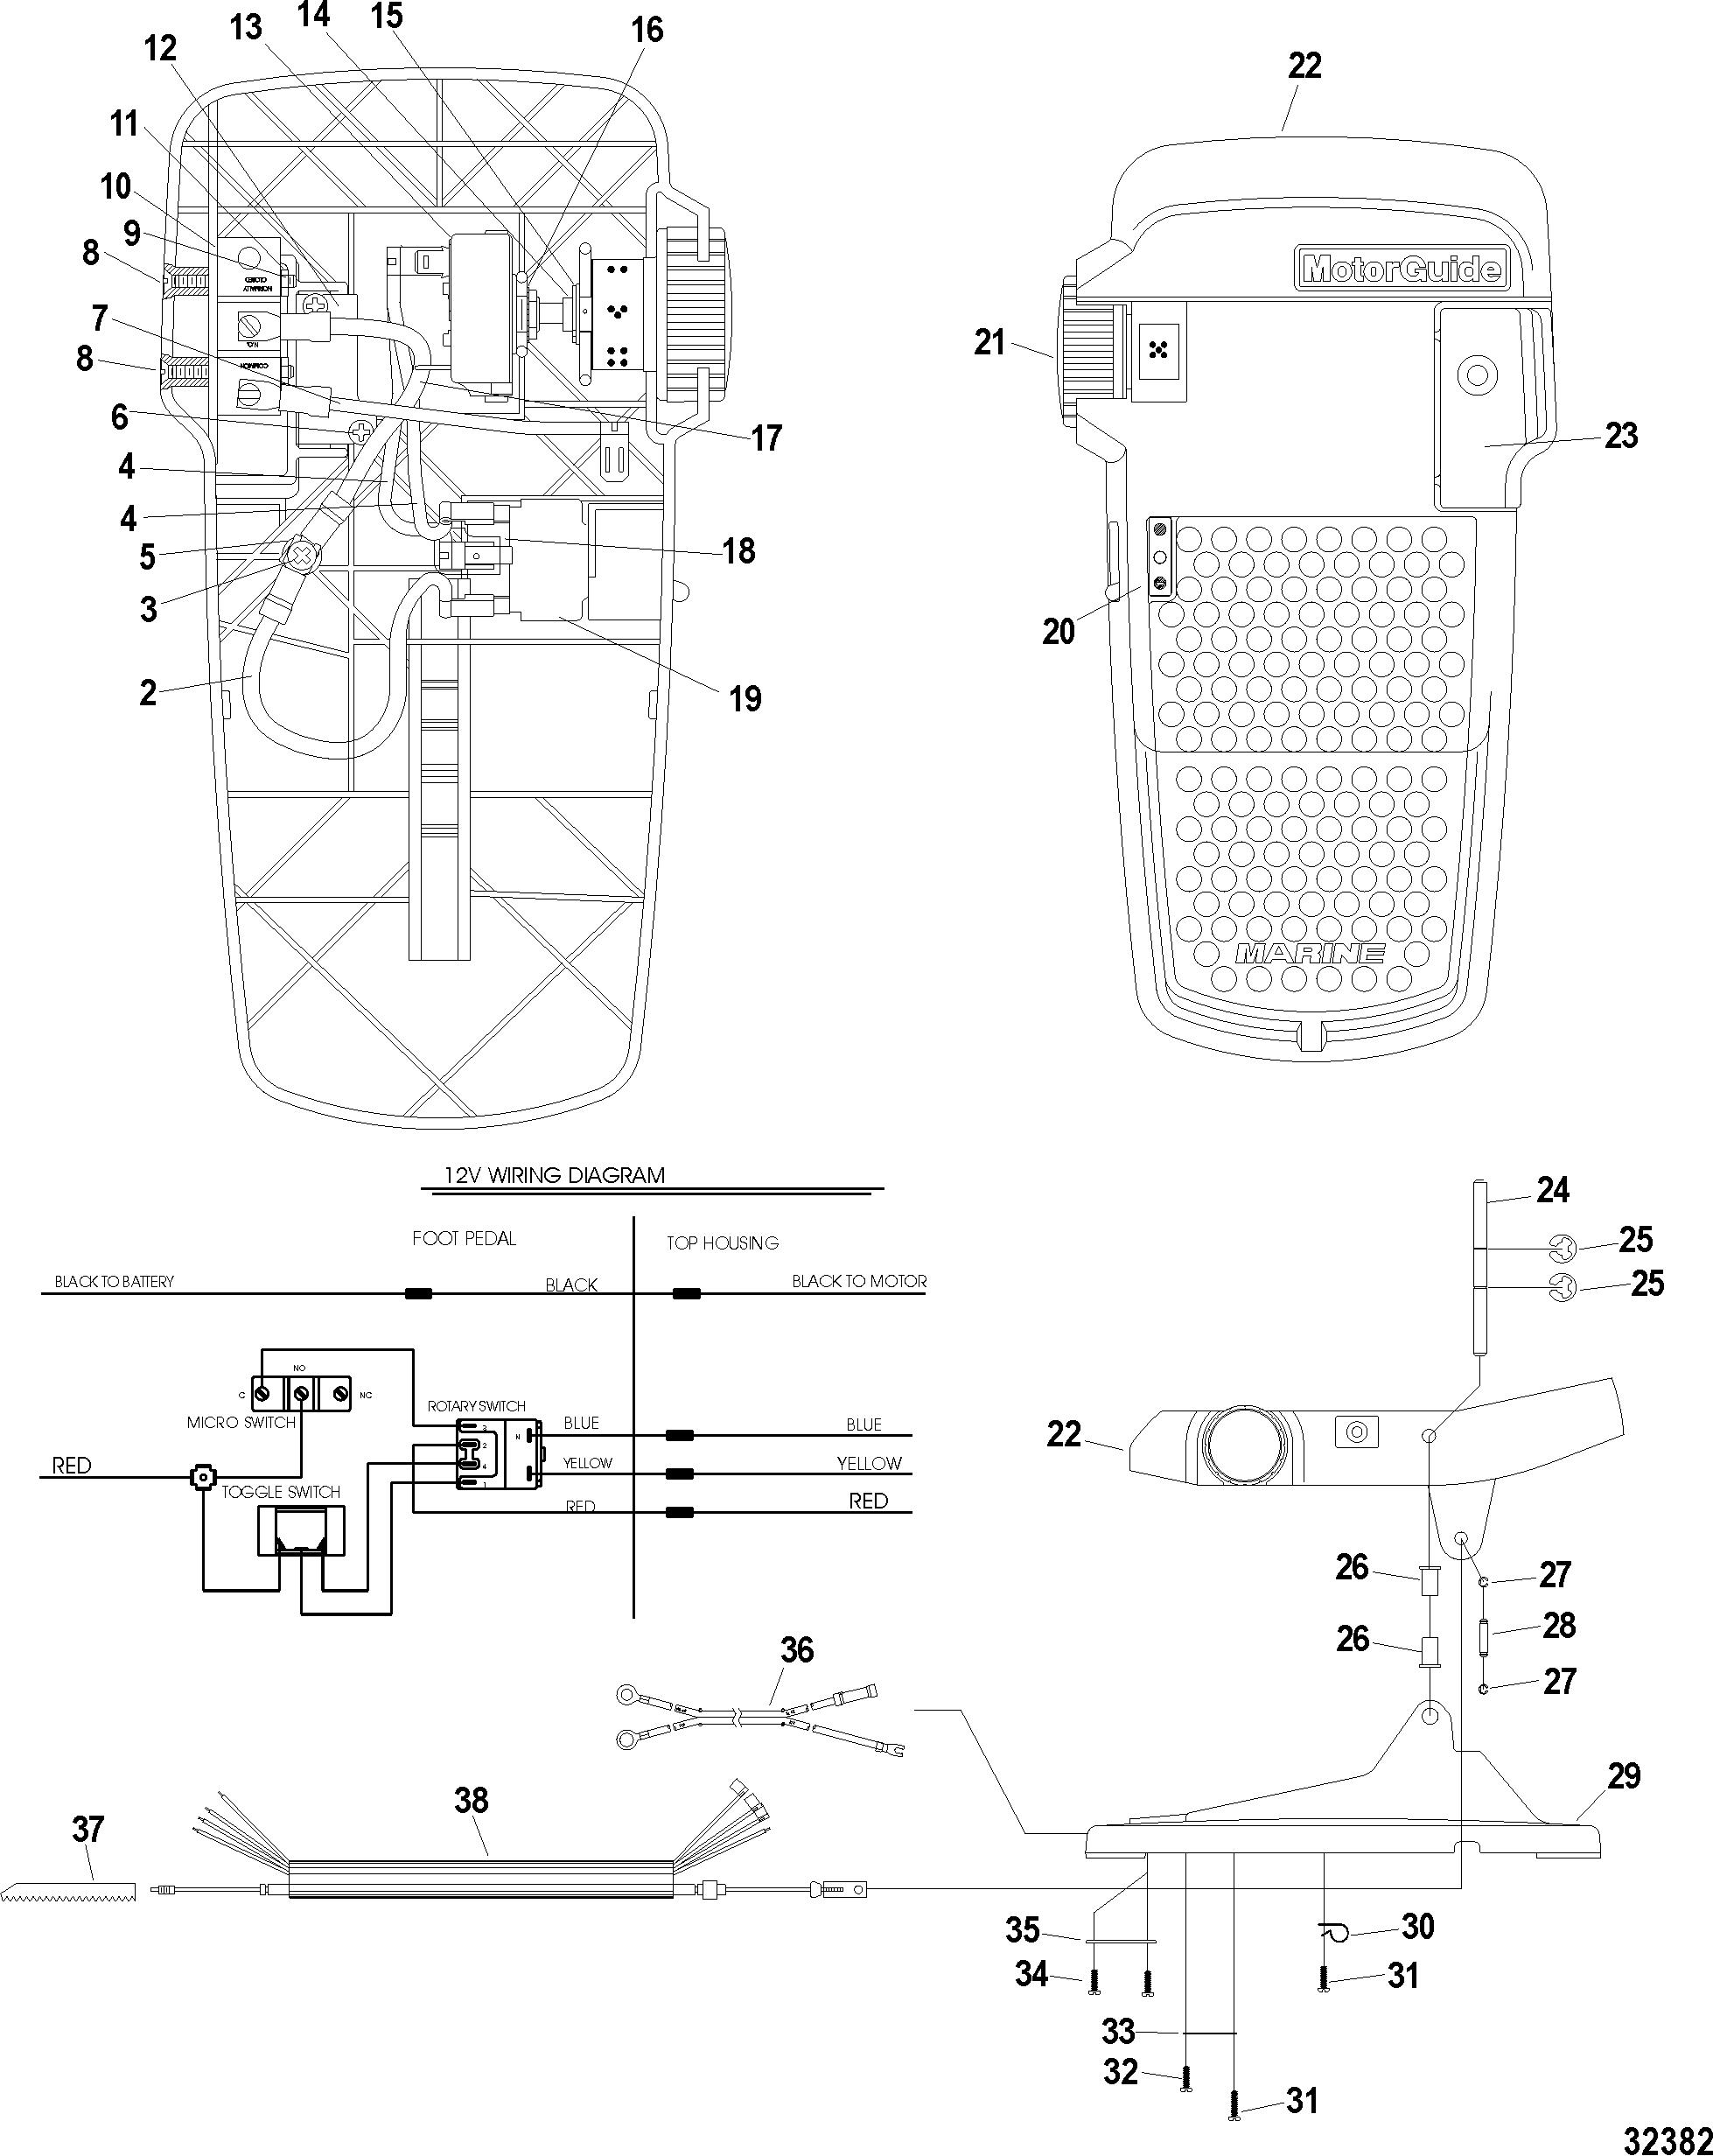 32382?resize\\\=665%2C837 diagrams 640563 minn kota trolling motor wiring diagram minn Chevy Starter Wiring Diagram at panicattacktreatment.co